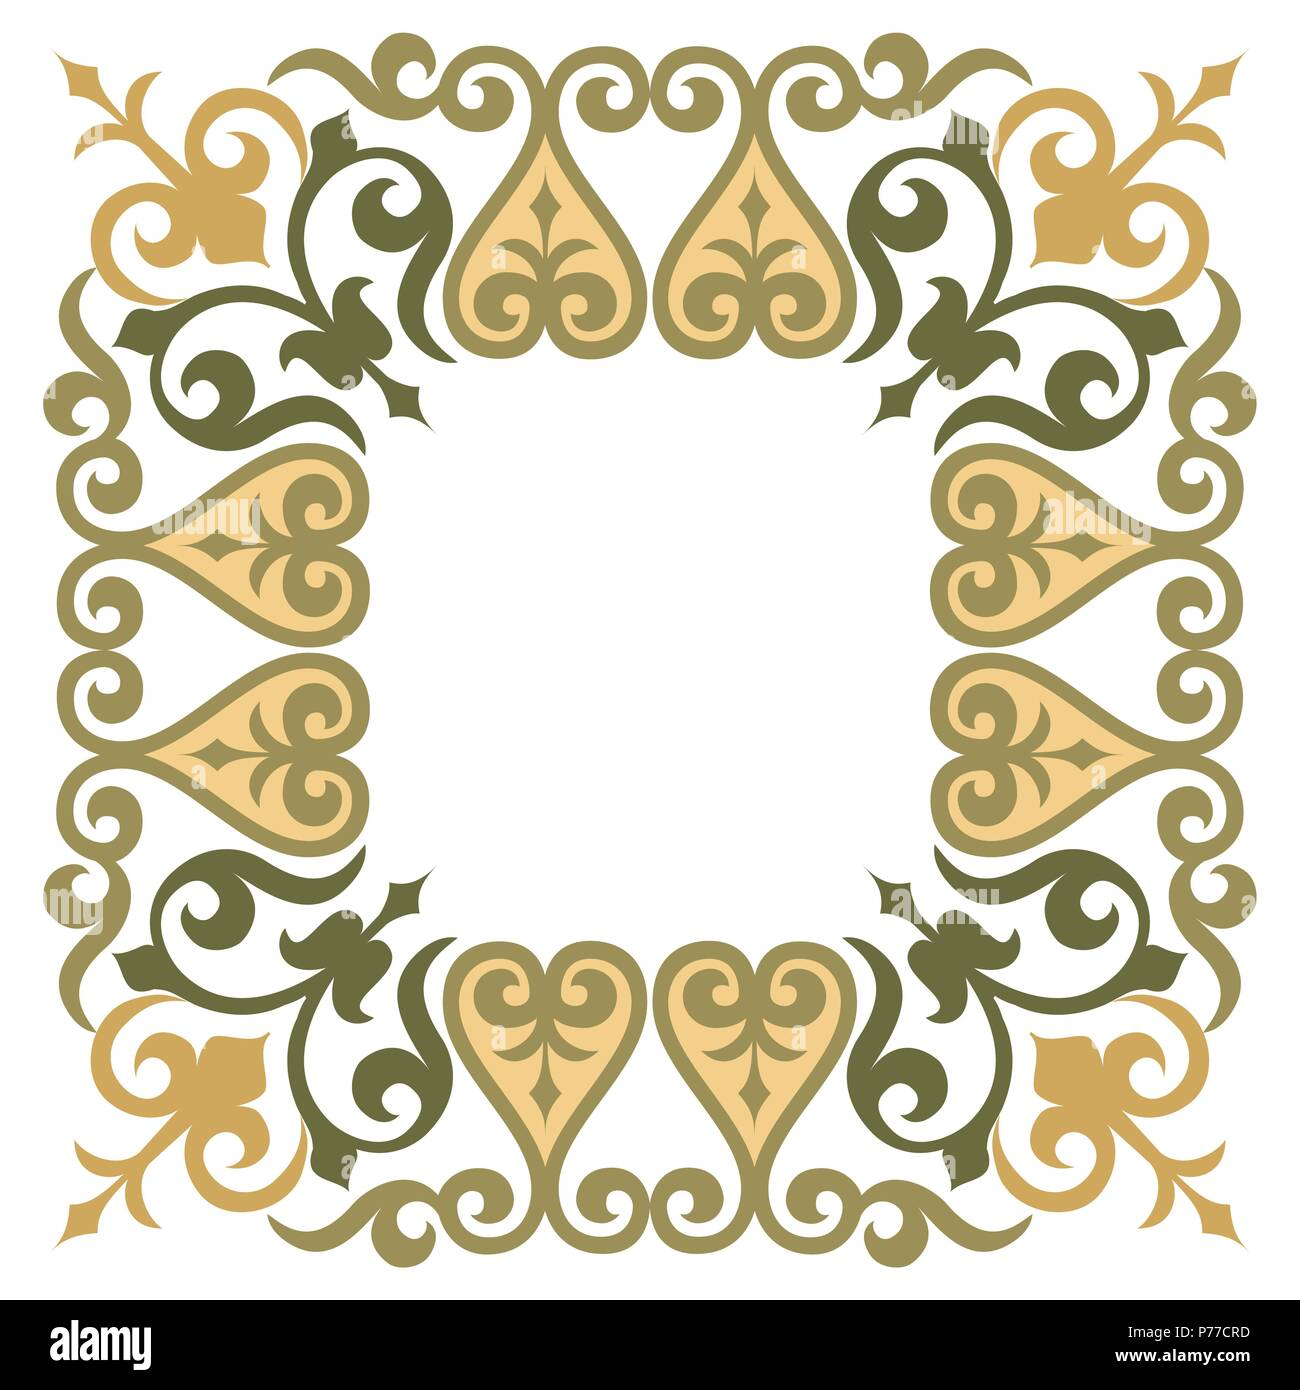 Elegante und einfache dekorative Rahmen Rahmen Vektor Abbildung ...